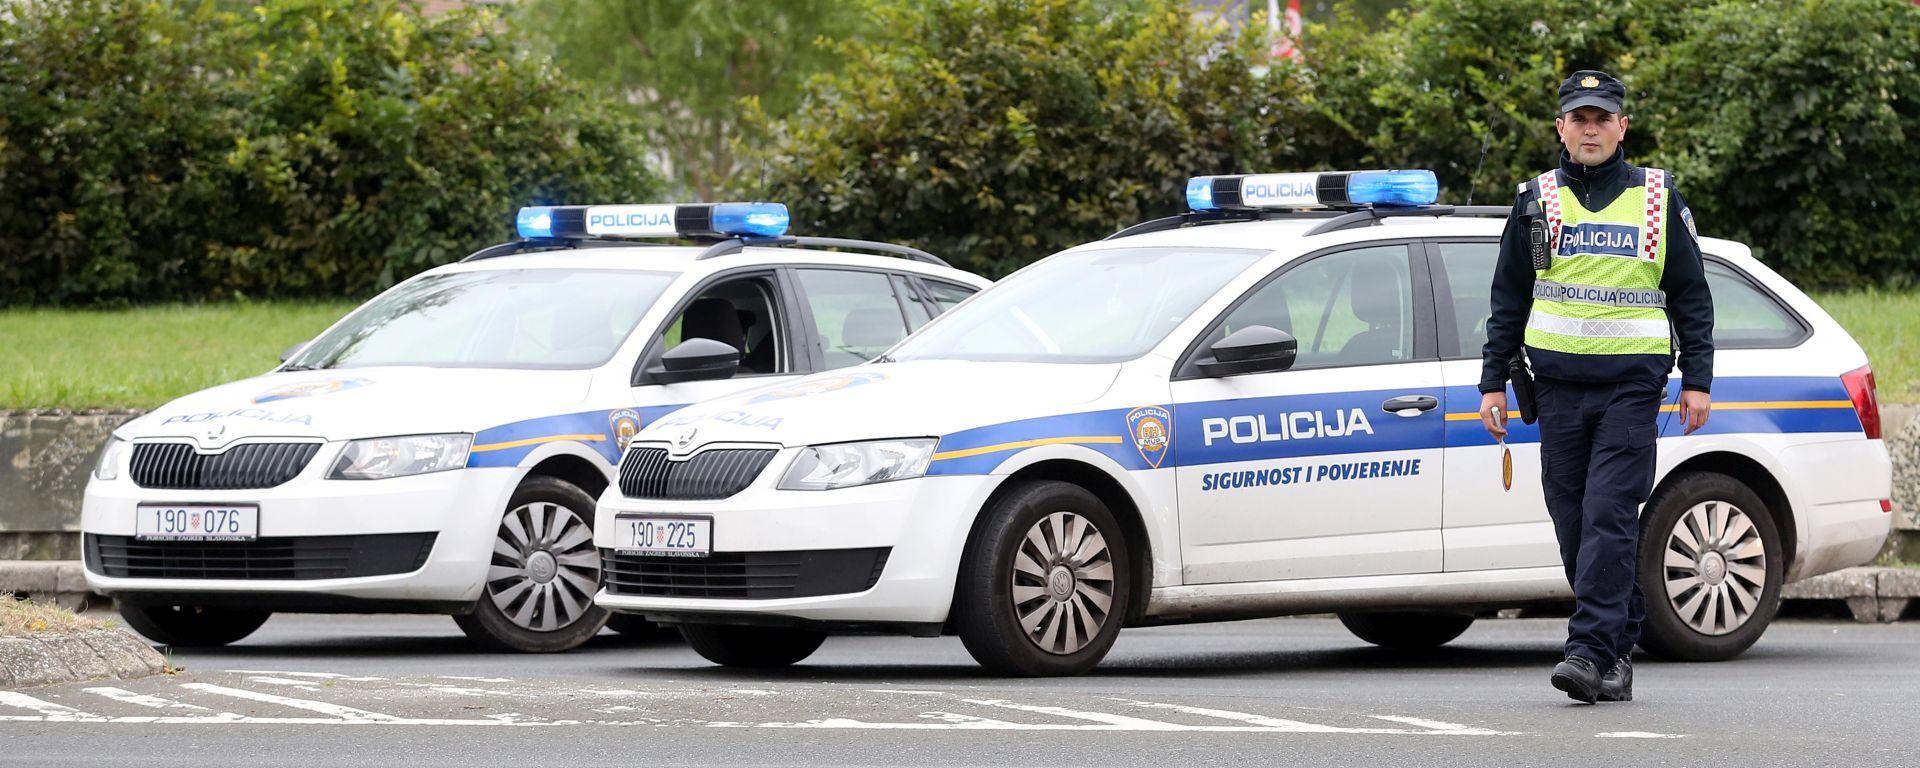 Beograđanin optužen za šverc ljudi progutao bateriju i žilet